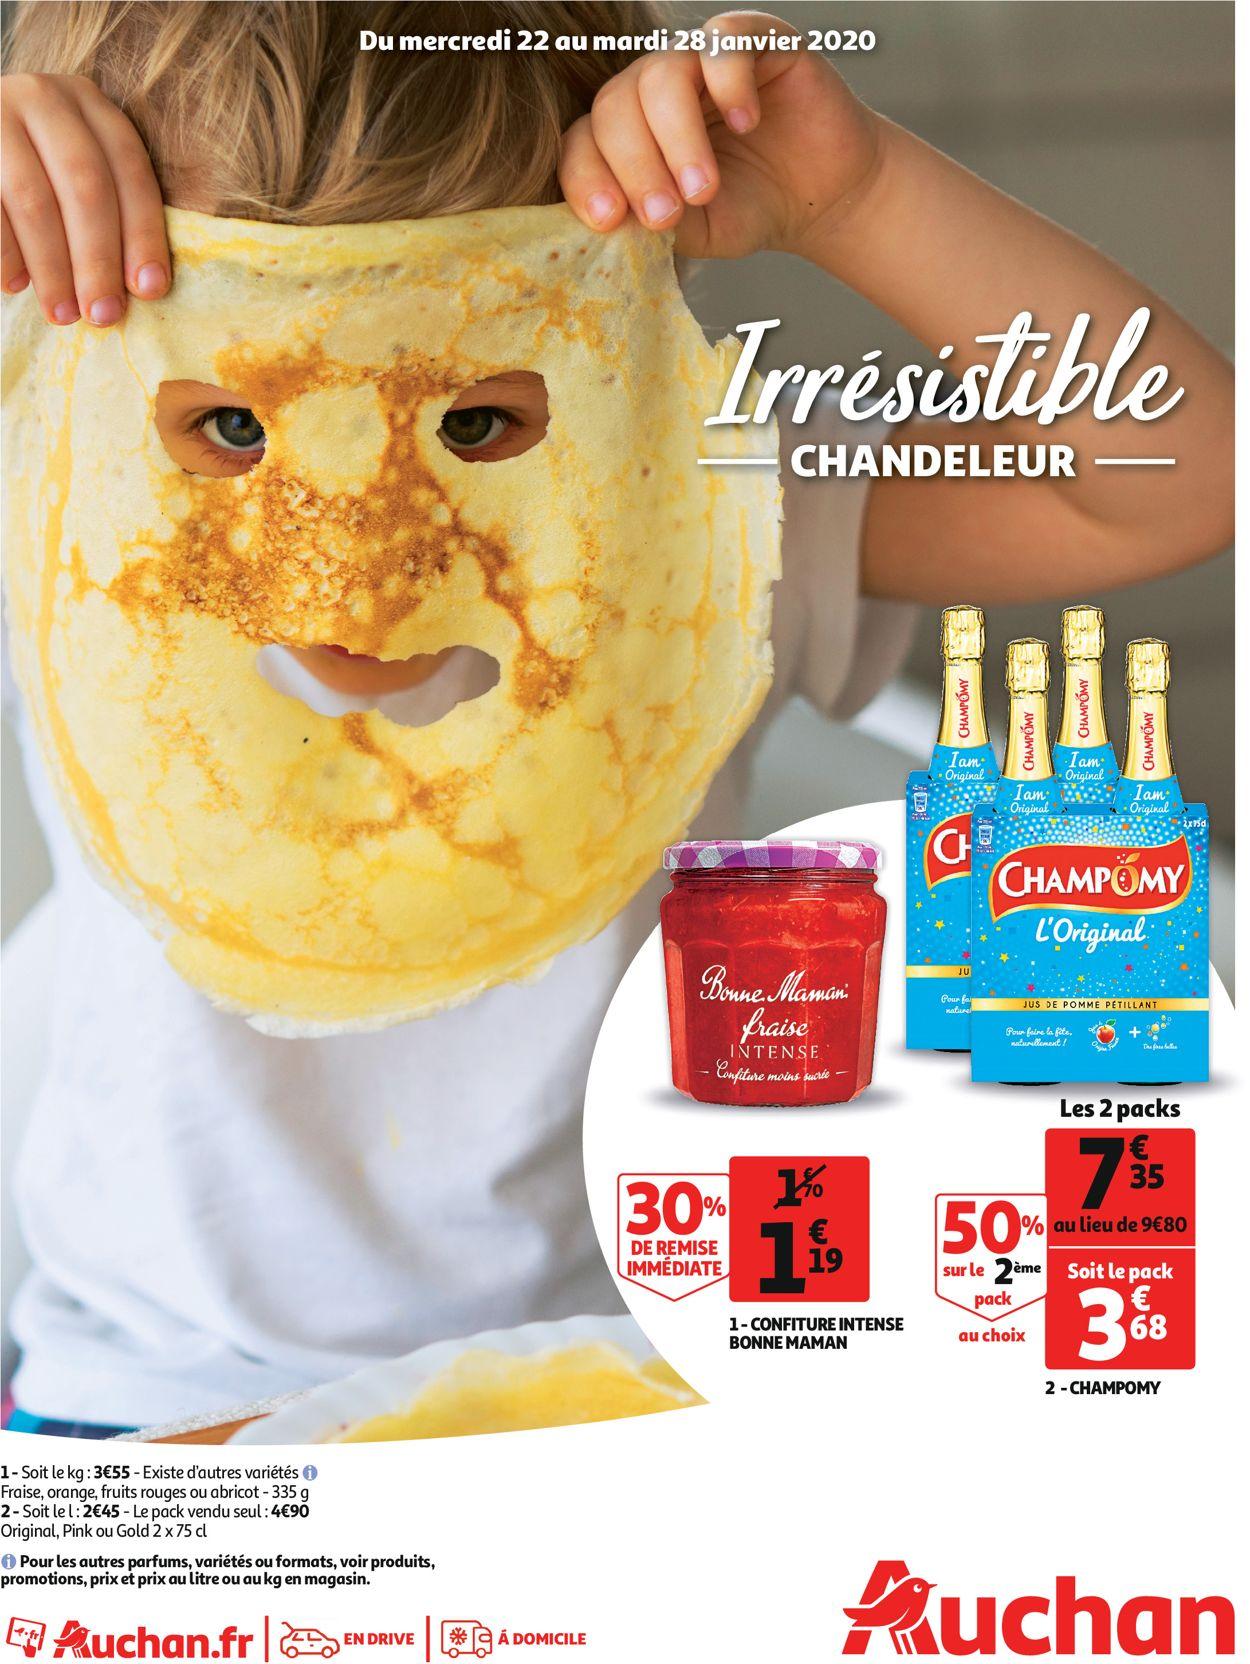 Auchan Catalogue - 22.01-28.01.2020